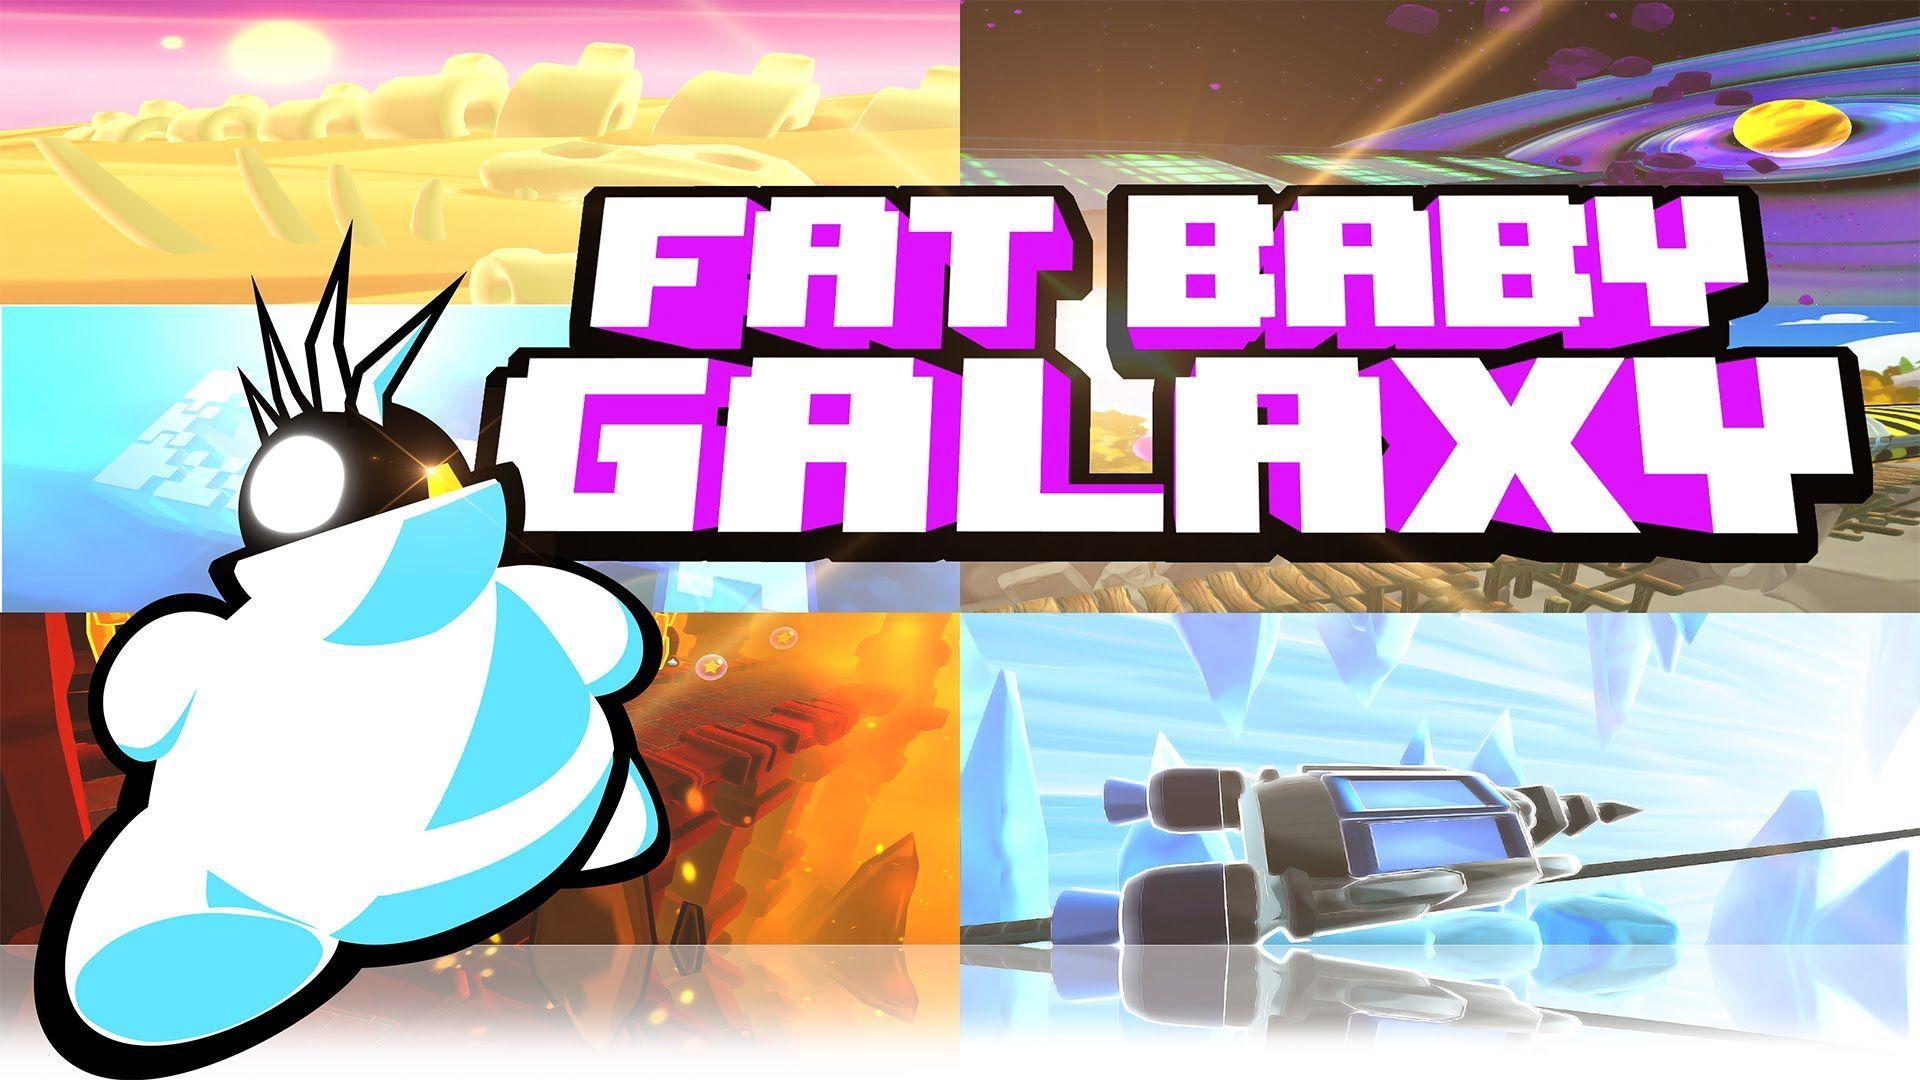 fat-baby-galaxy-portada